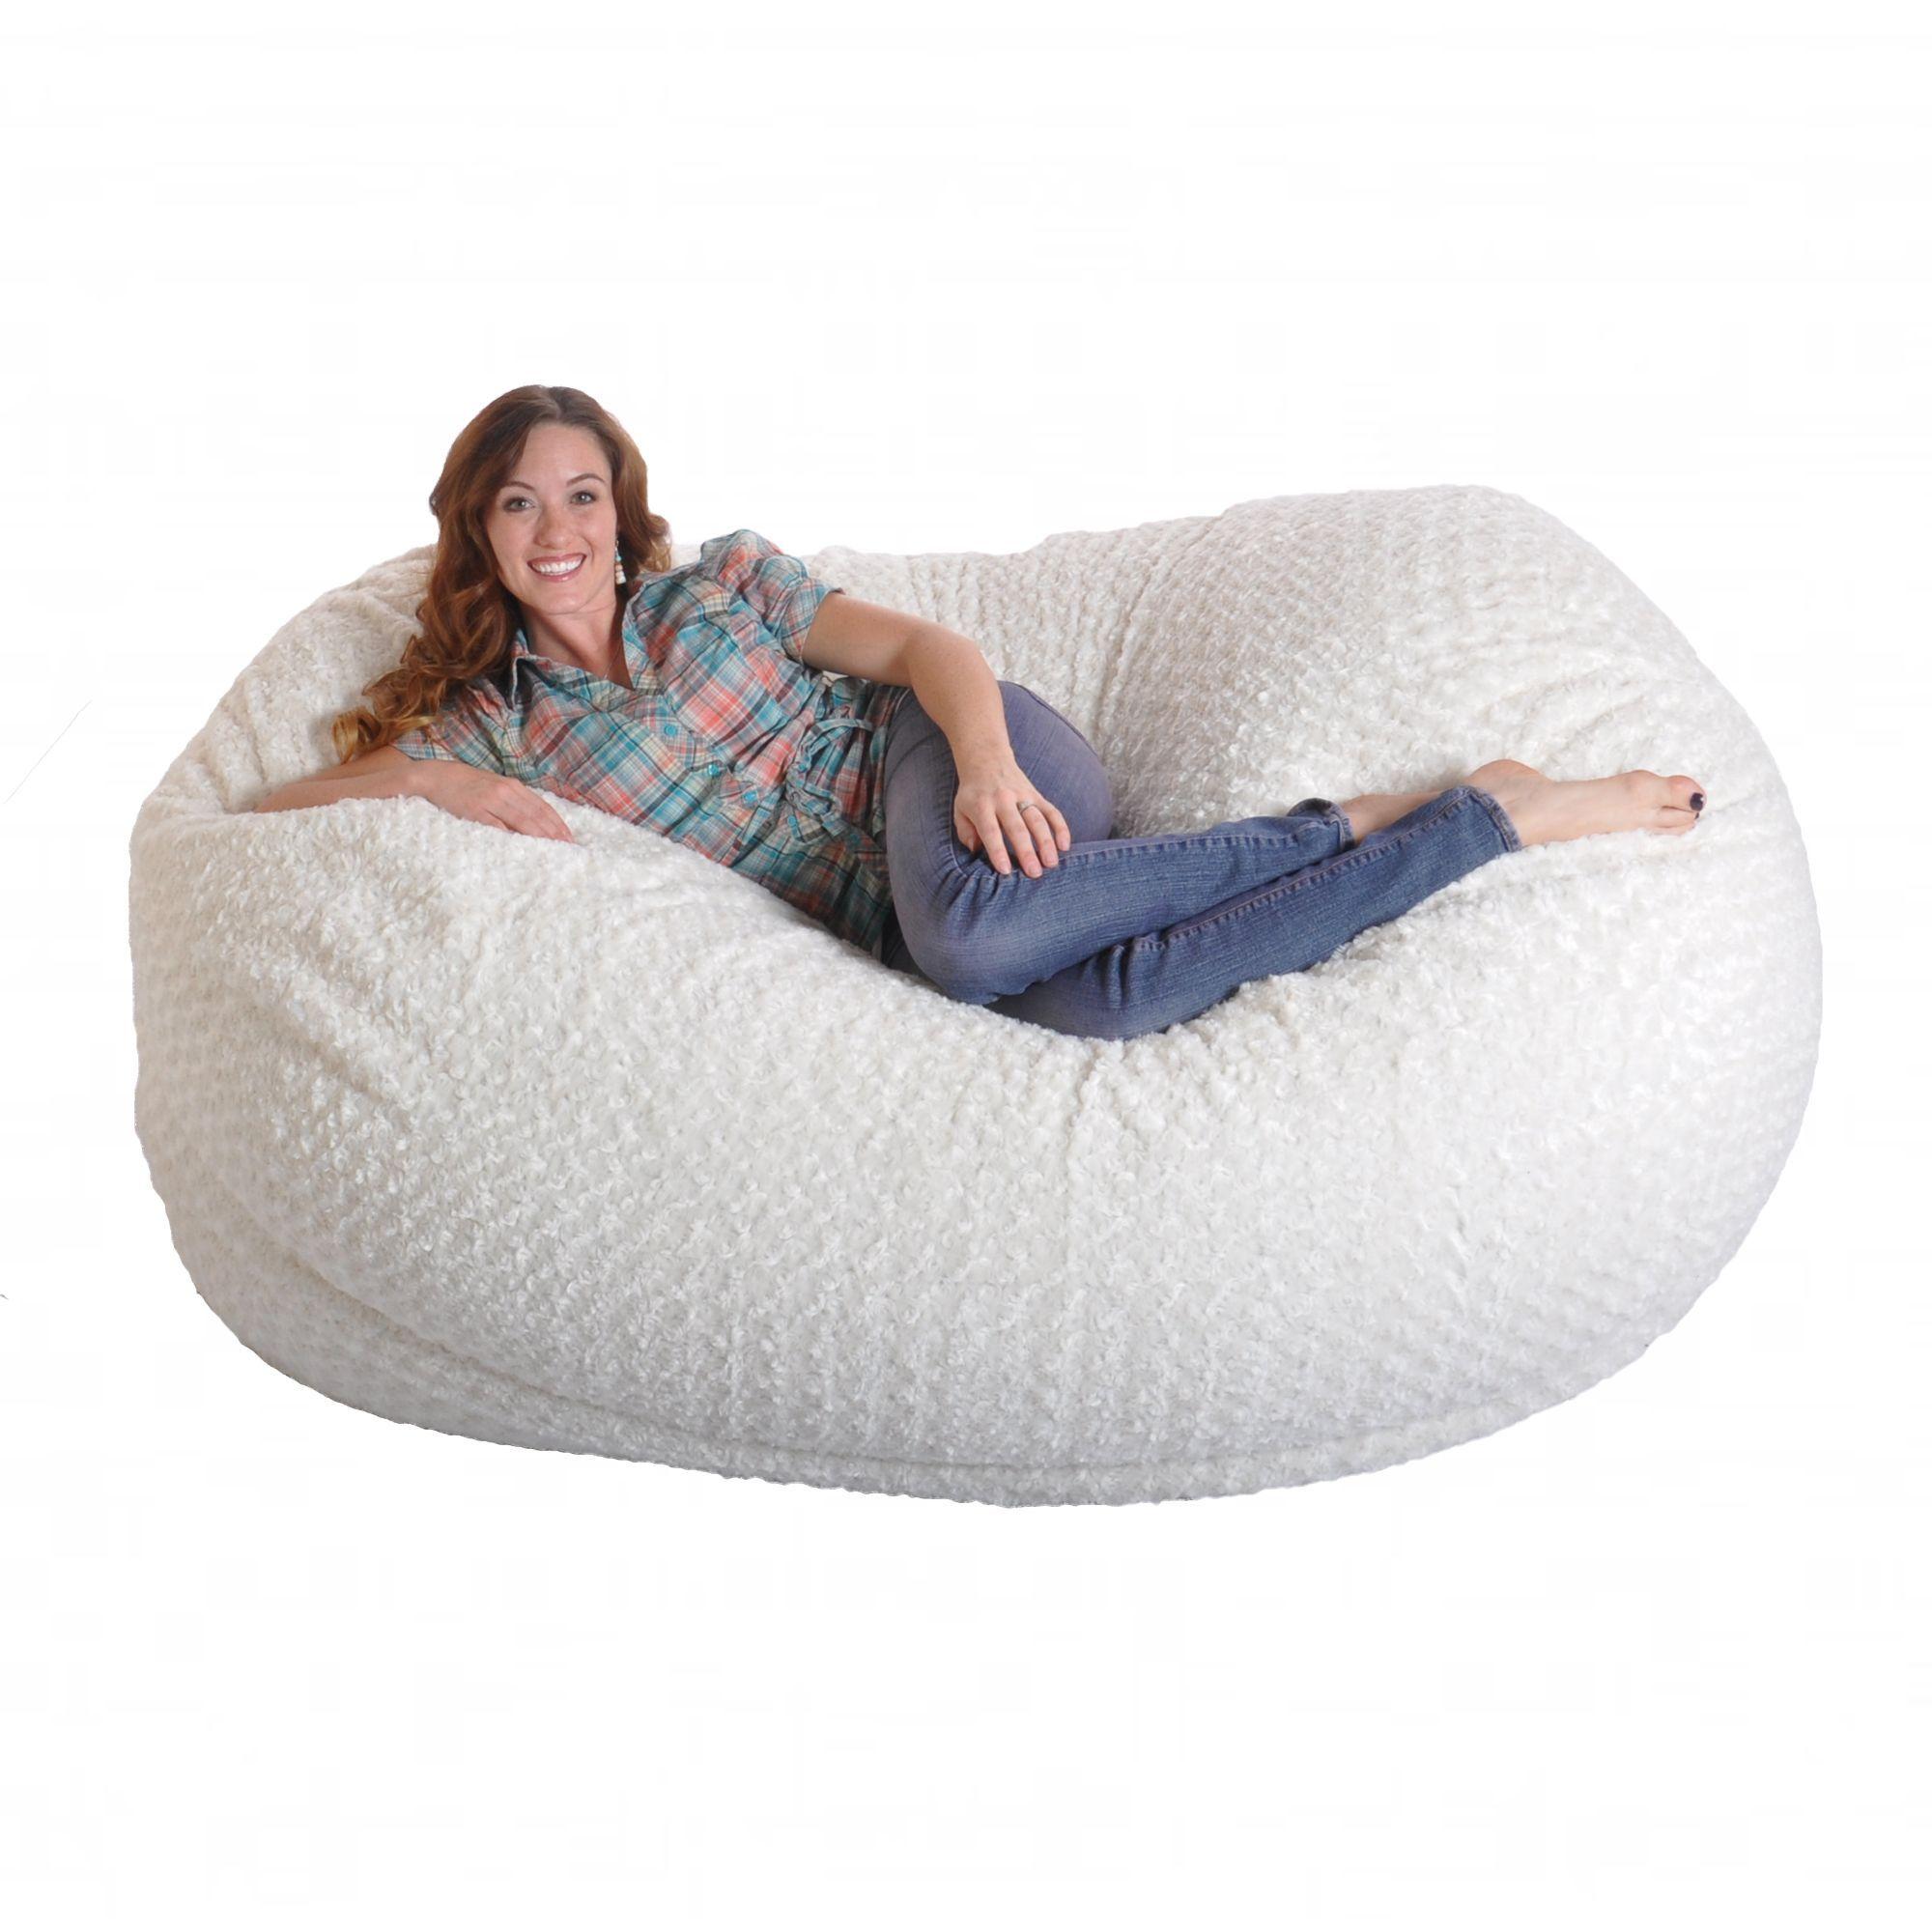 6 foot Soft White Fur Oval Microfiber Memory Foam Bean Bag